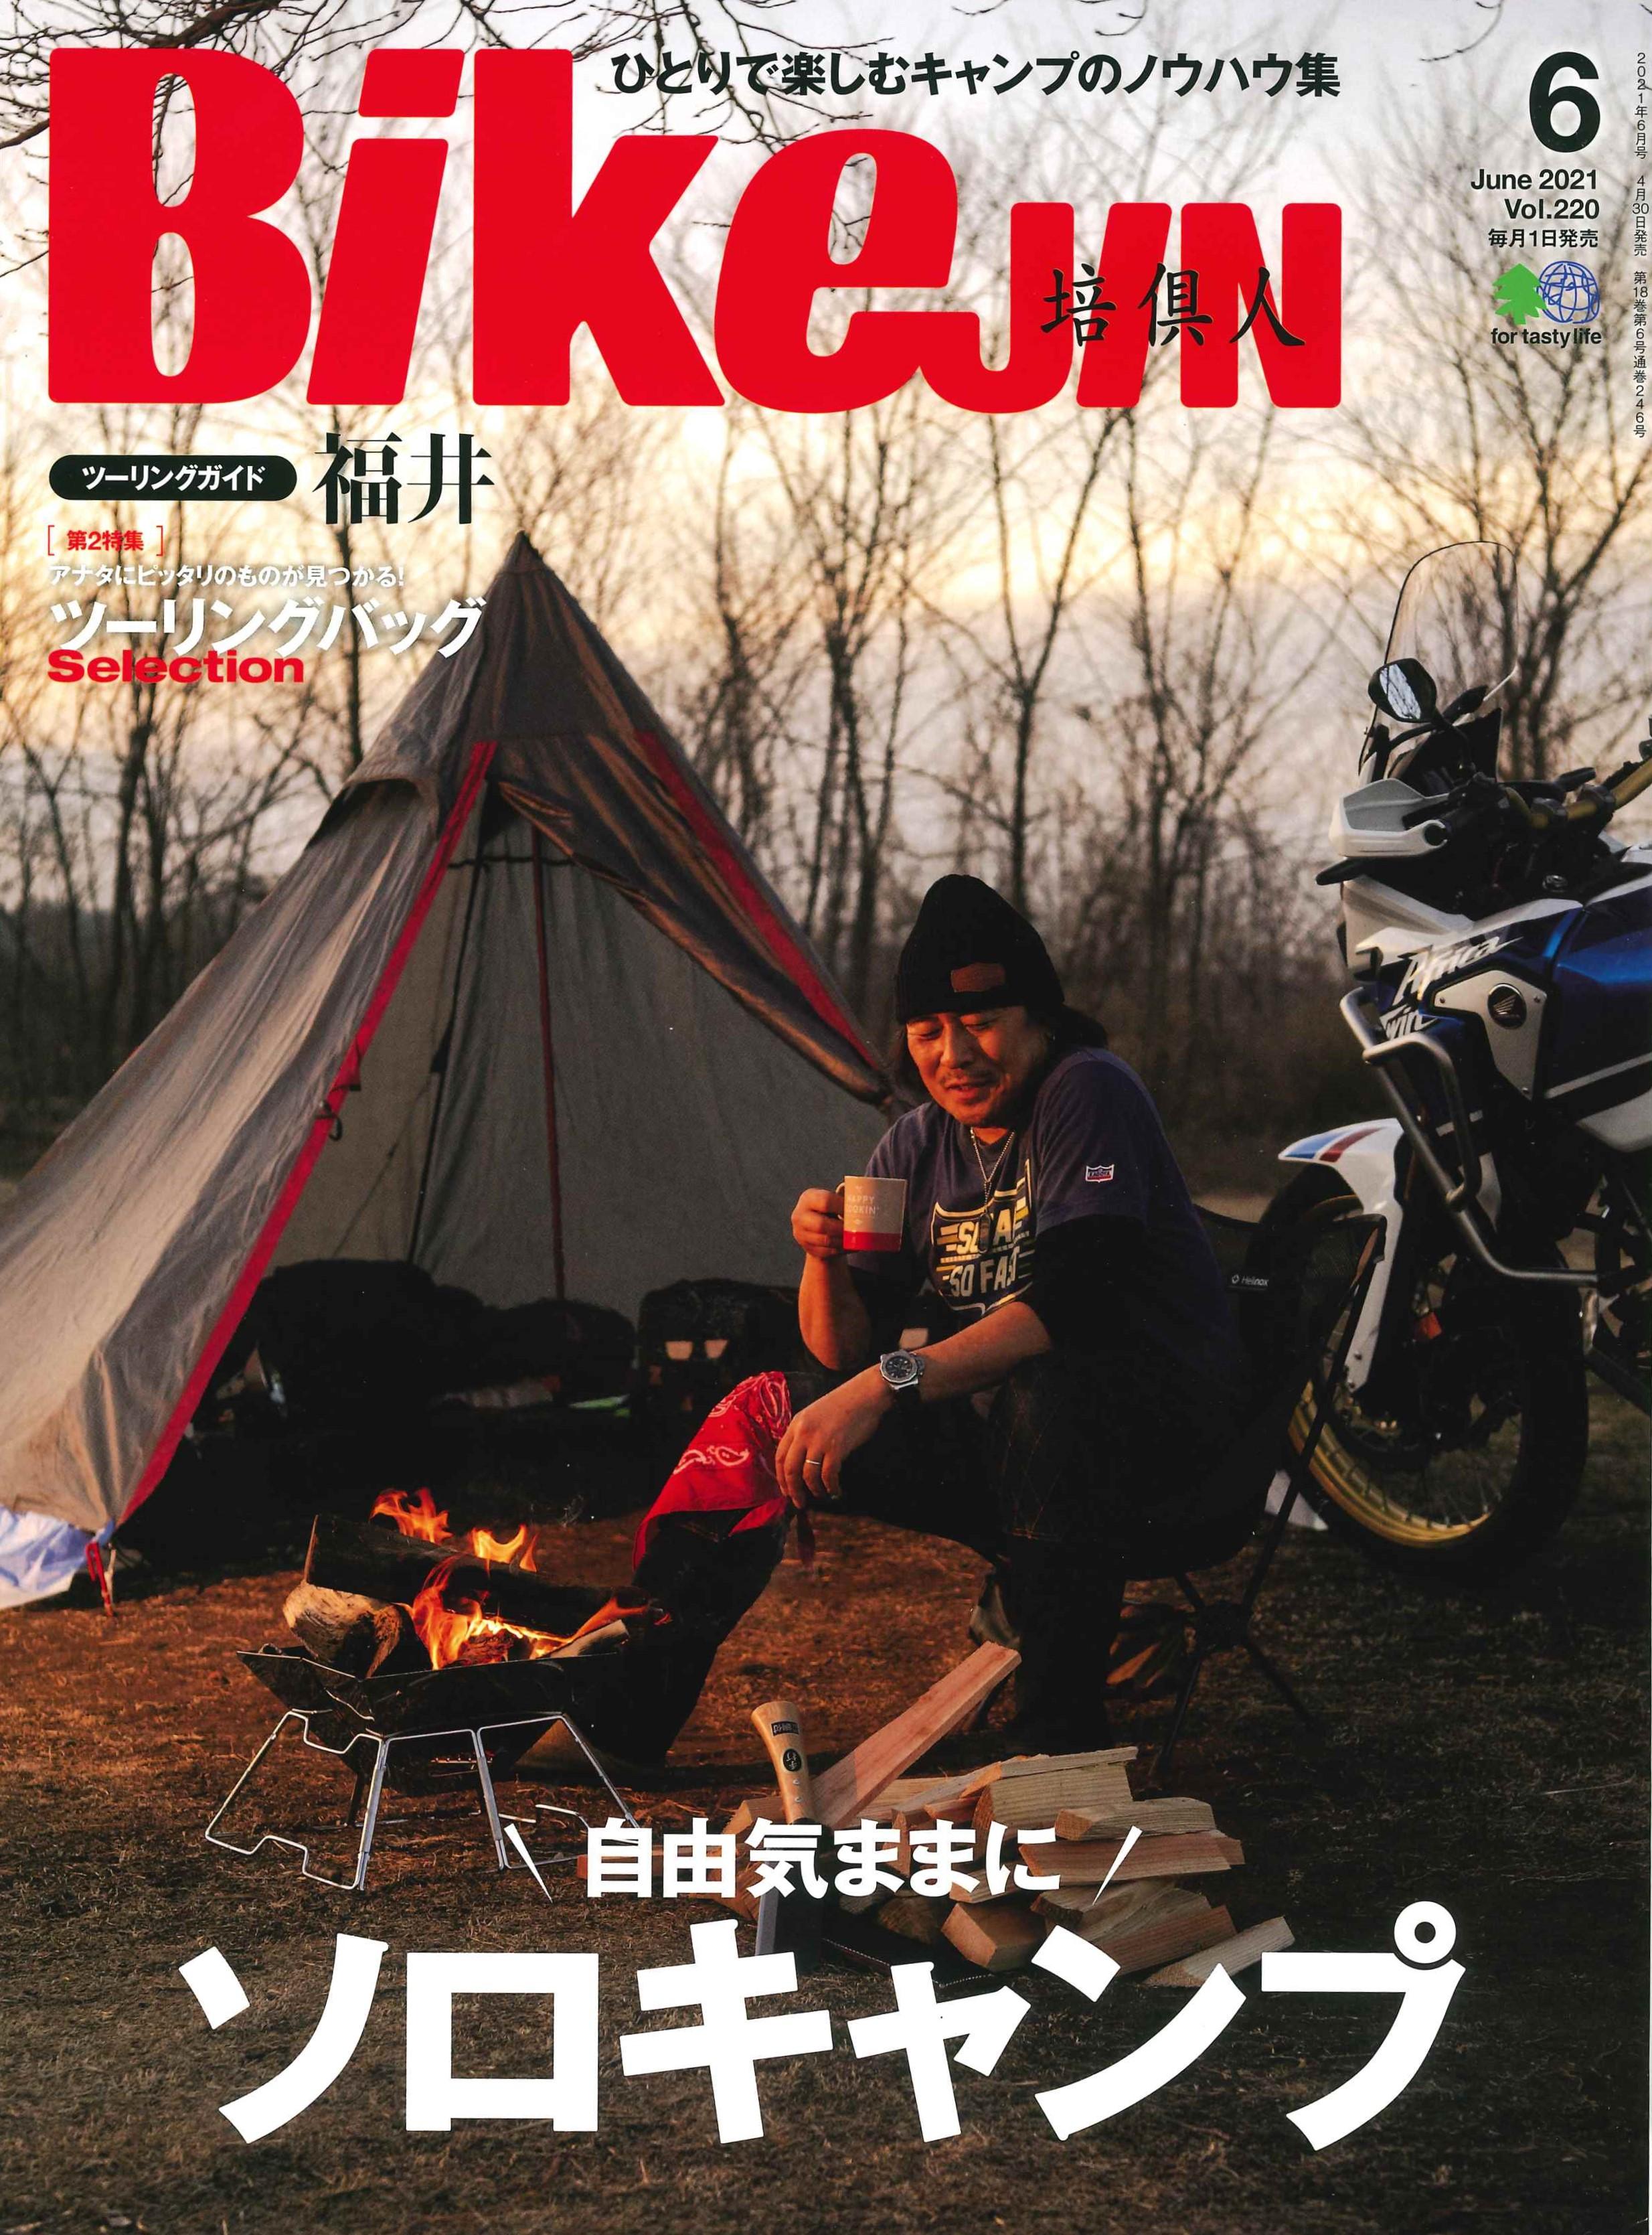 【BikeJIN 2021年6月号掲載】B+COM SB6X / ONE